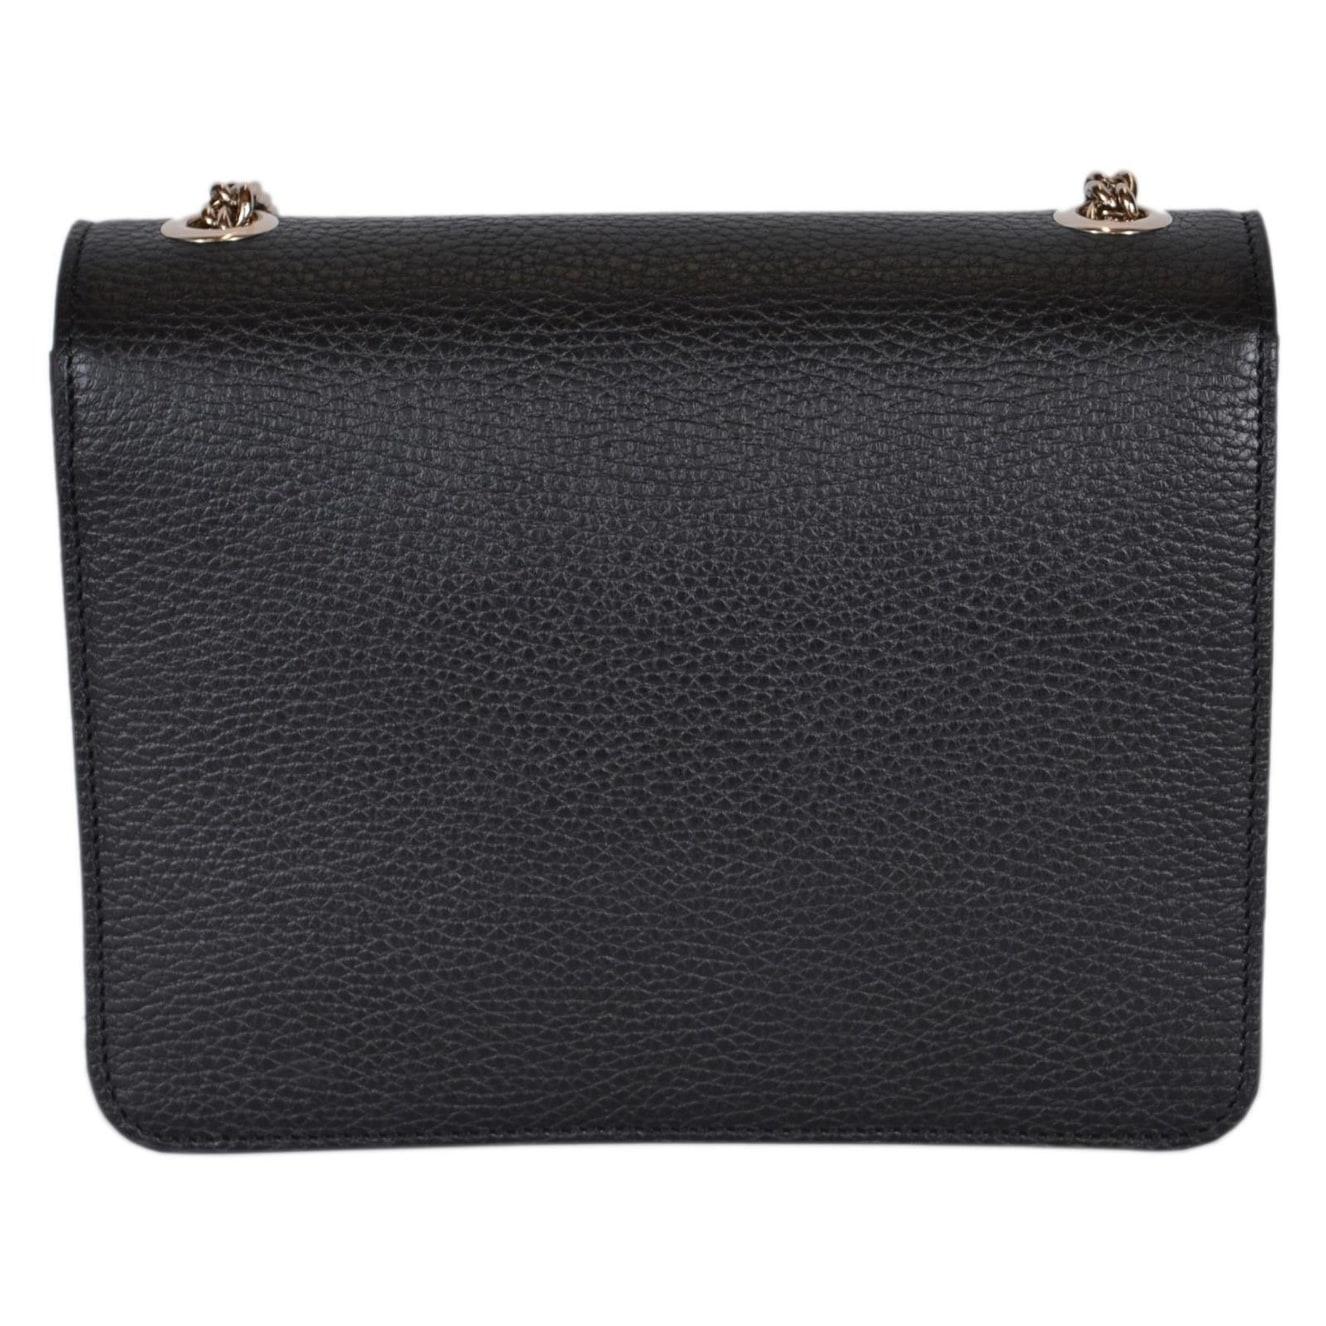 d630354f2 gallery; arli small shoulder bag; gucci sylvie velvet cross body bag; gucci  women s black leather 510304 interlocking gg crossbody purse handbag 7 75 x  6 x ...